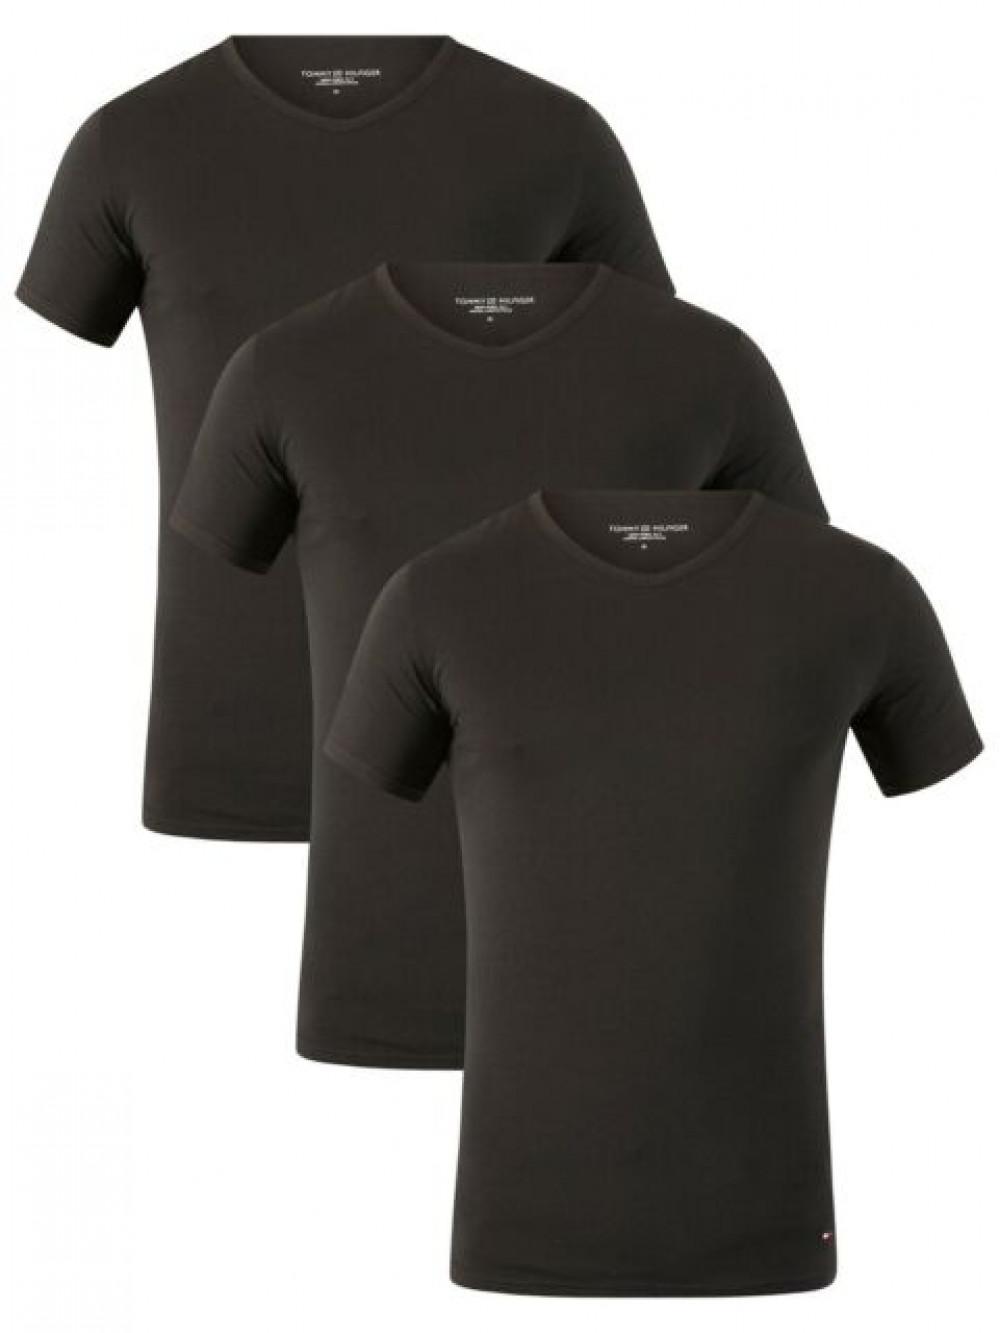 Pánske tričko Tommy Hilfiger V-Neck Tee SS čierne 3-pack